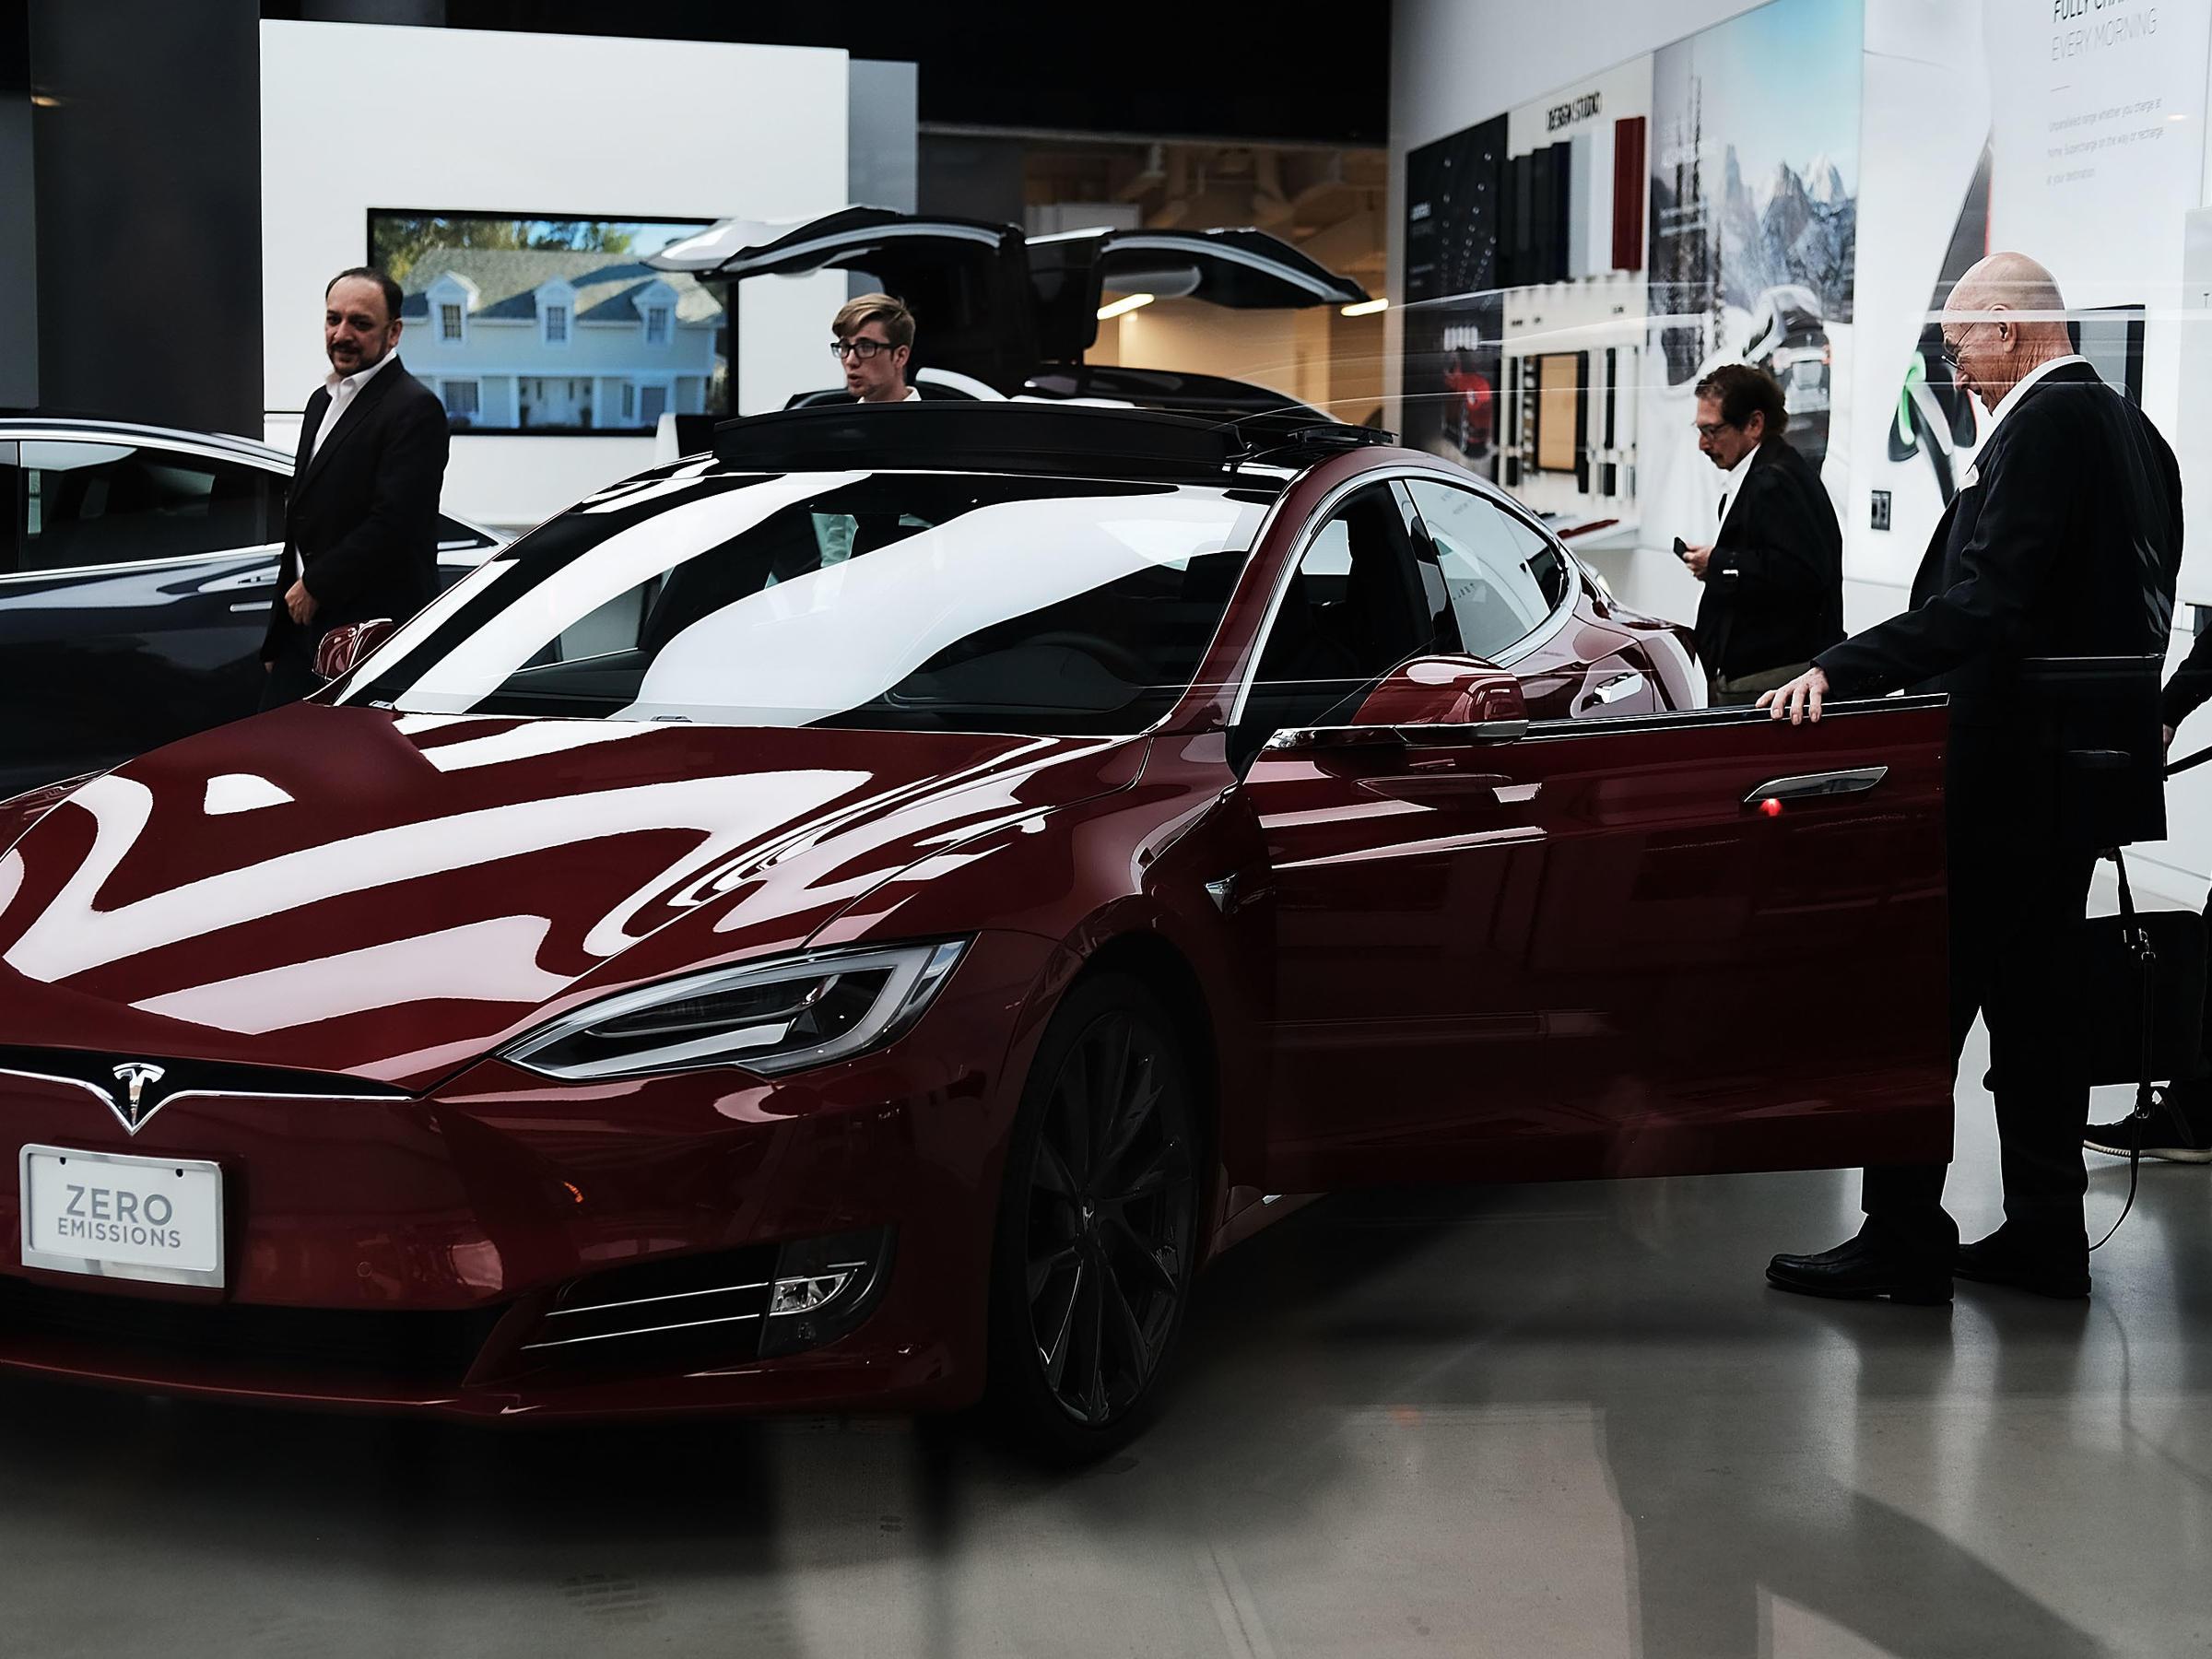 Elon Musk: Saudis in talks to take Tesla private